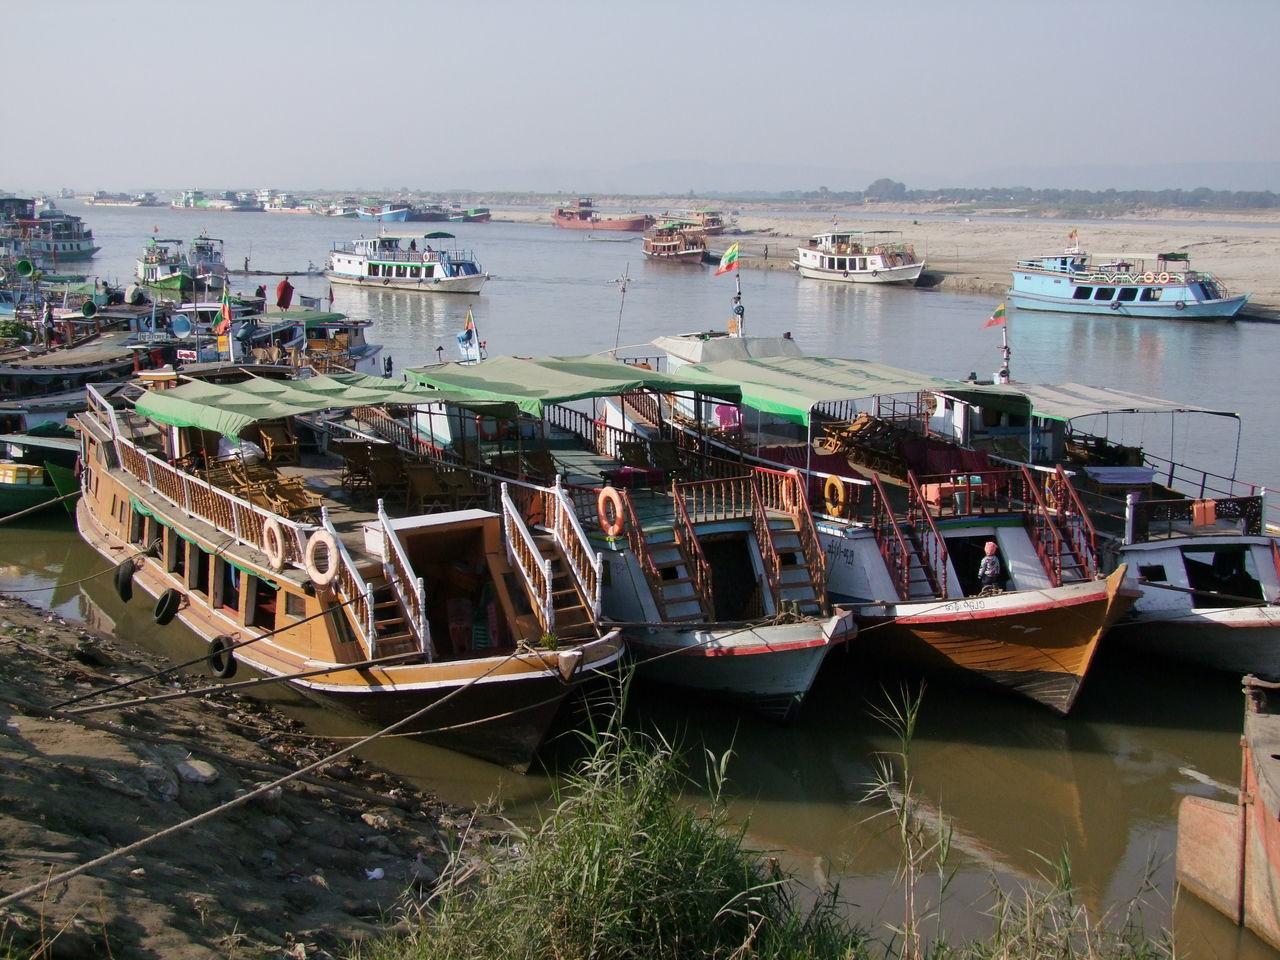 Boast at Mandalay Port on Ayeyarwady River Ayeyarwady River Botany Composition Ferries Harbor Jetty Mandalay Mode Of Transport Myanmar Nautical Vessel No People Outdoor Photography River River Bank  River Boats Sunlight And Shadows Transportation Water